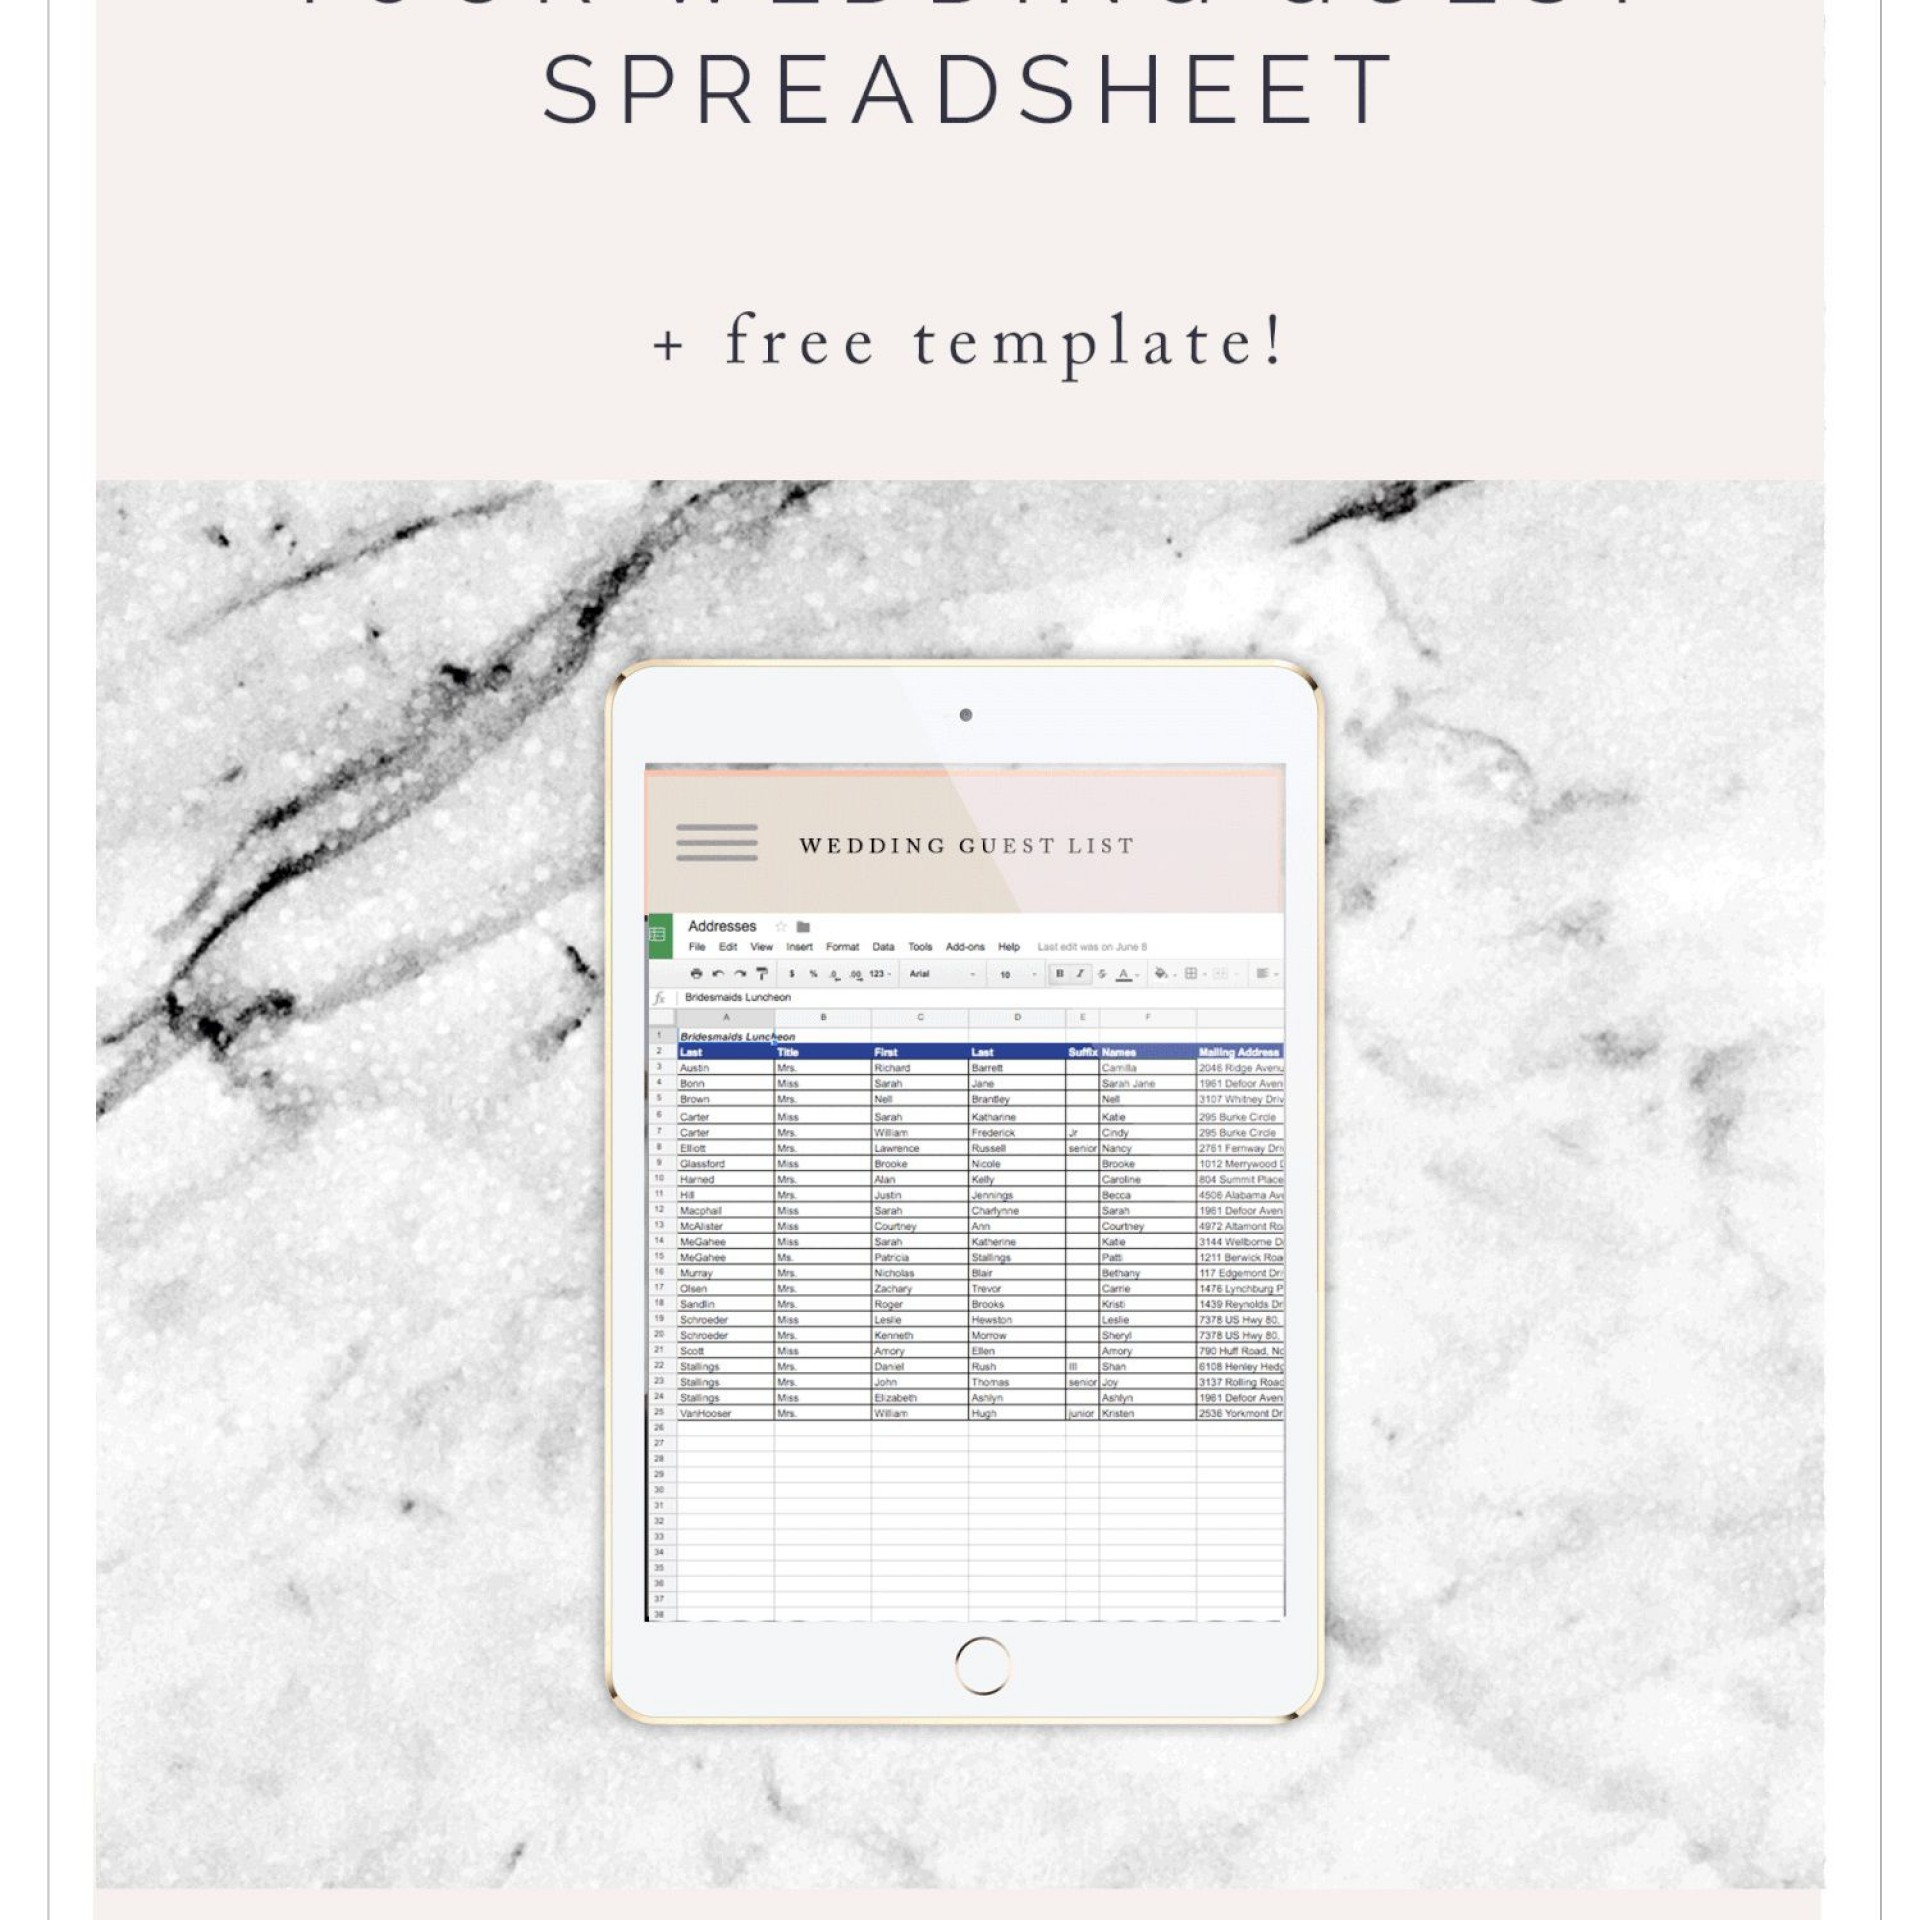 Wedding Guest List Template Excel Addictionary